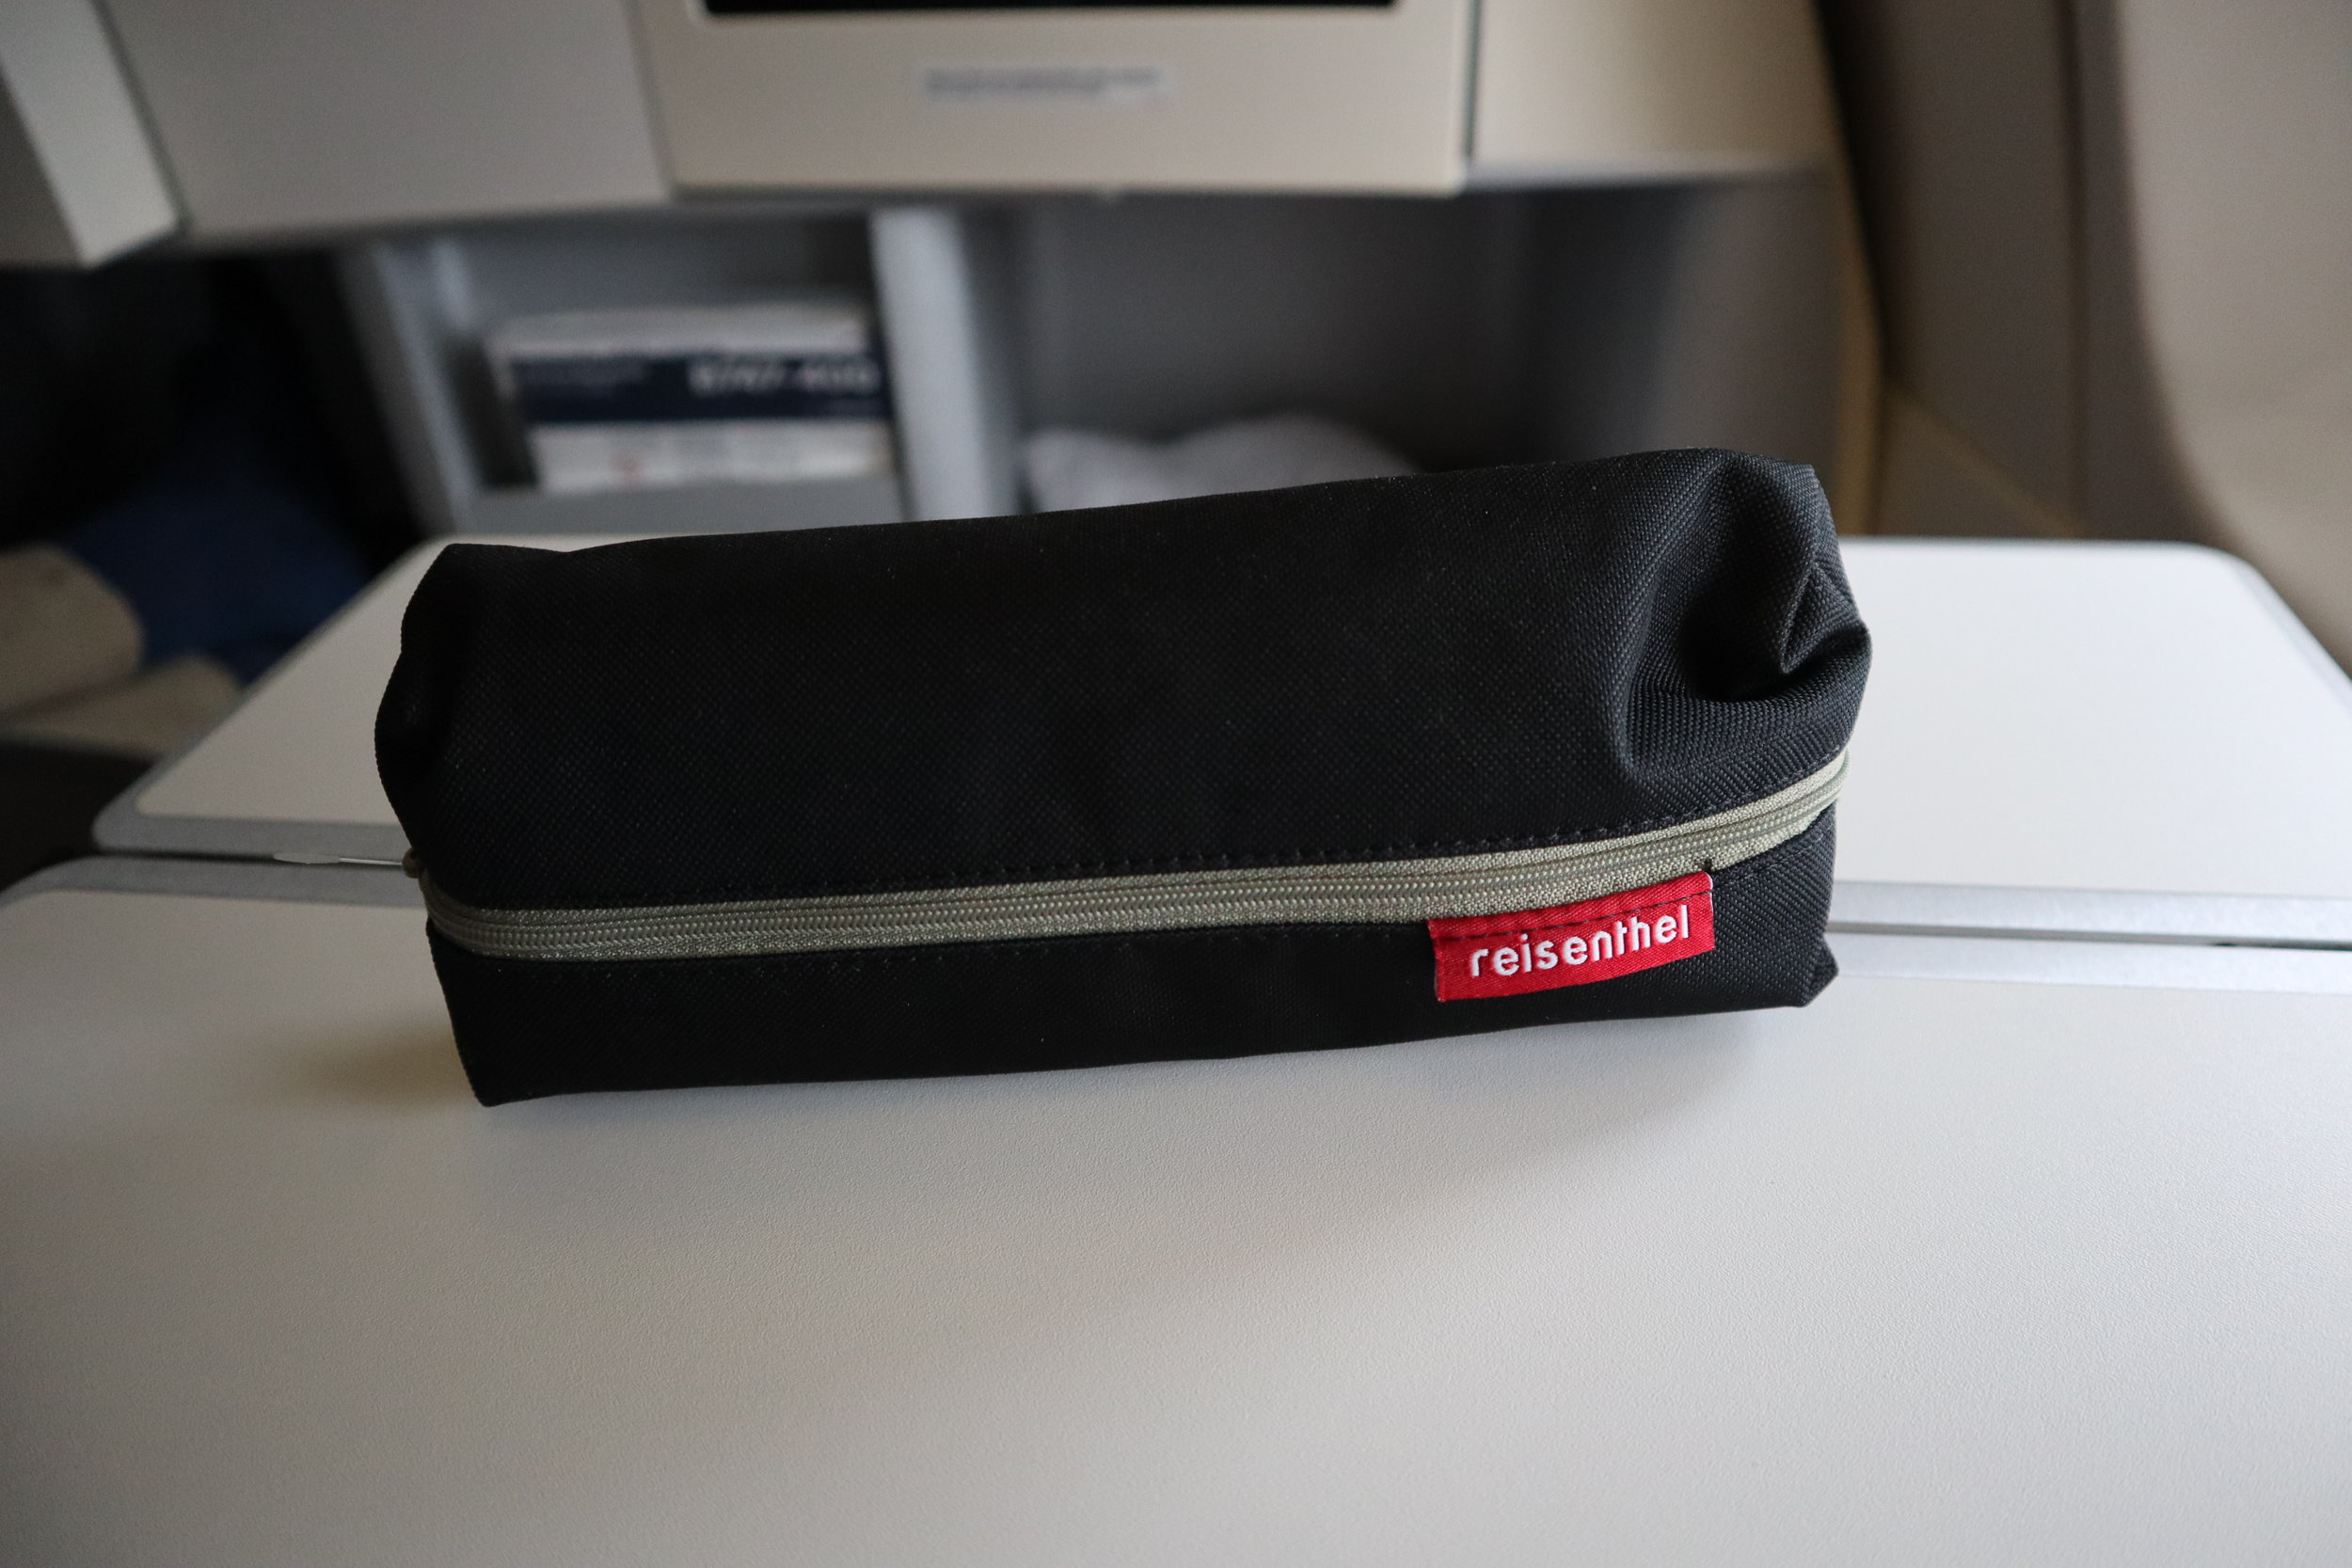 Lufthansa 747-400 business class – Amenity kit